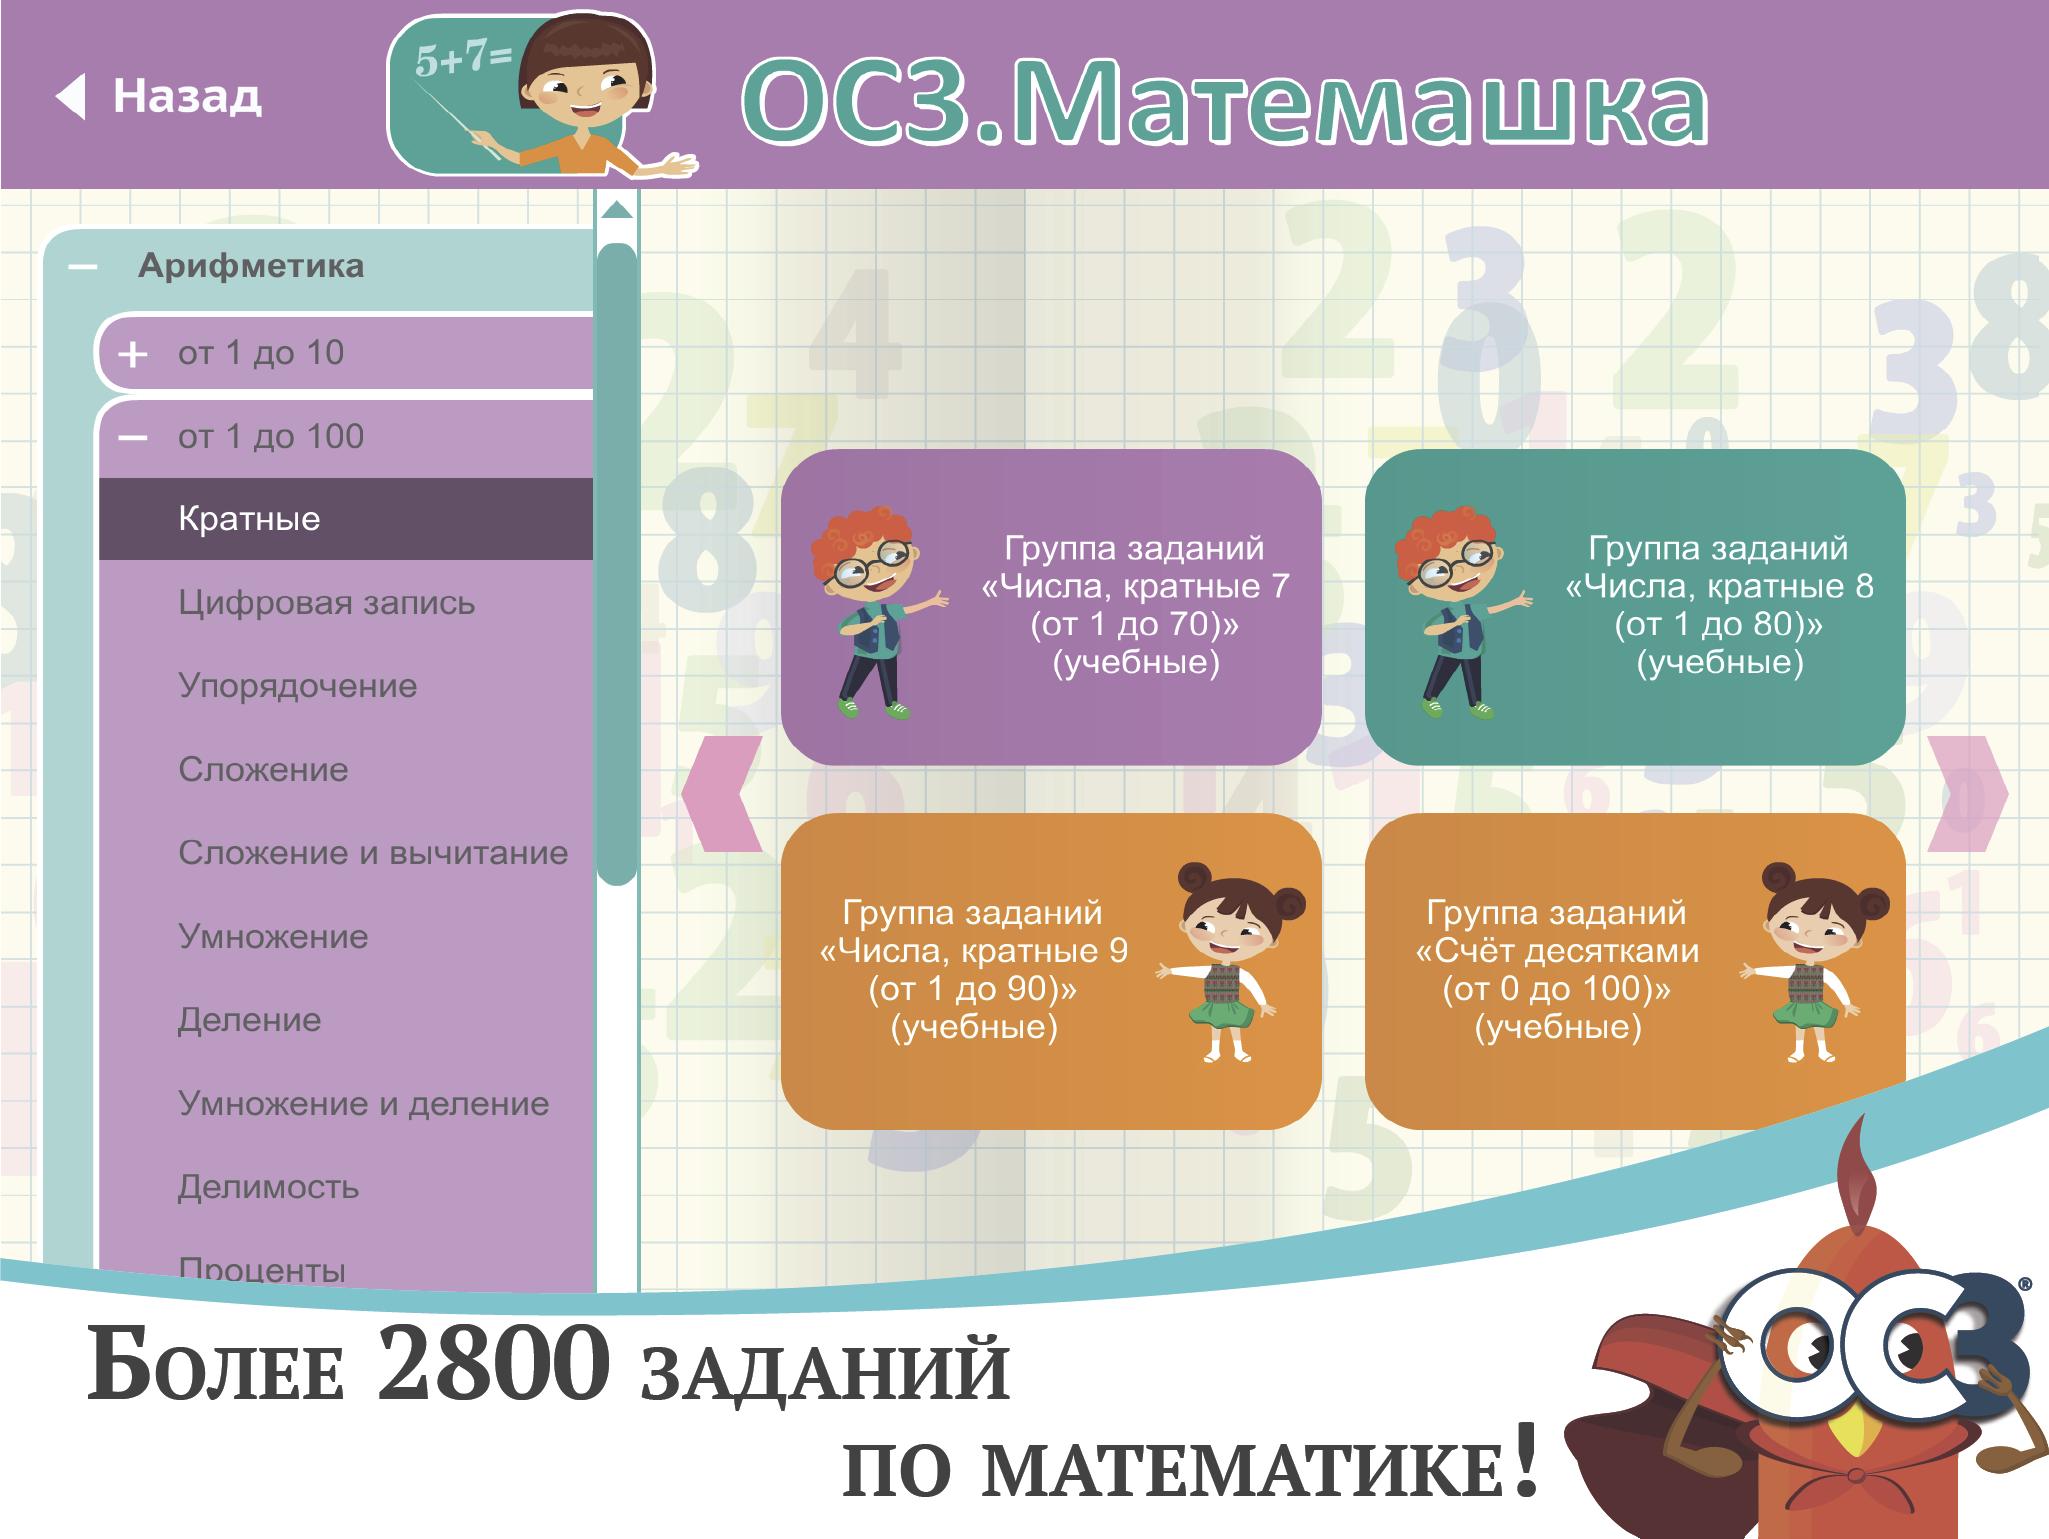 ОС3. Матемашка